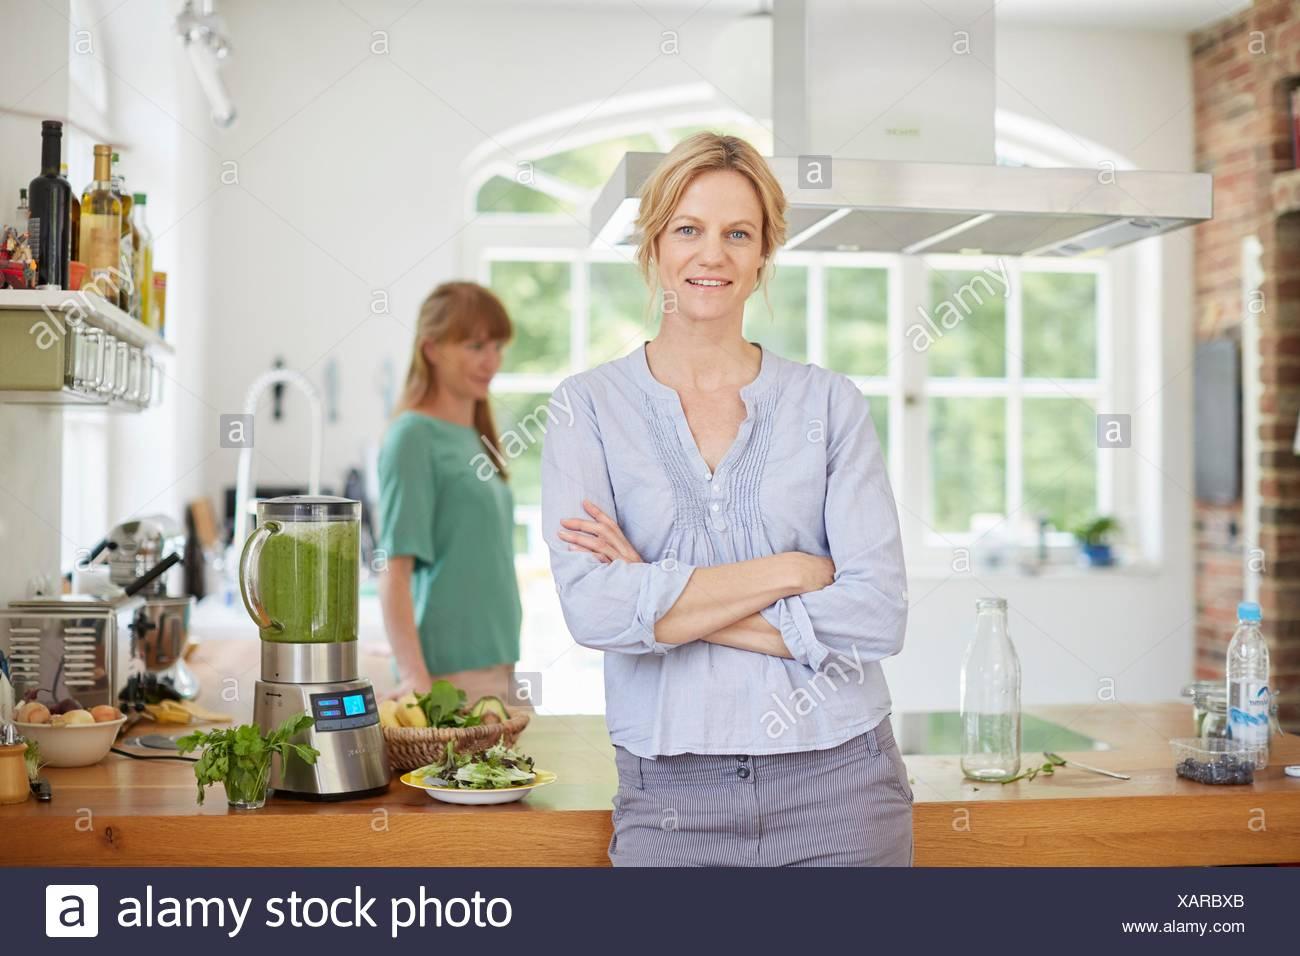 Women next to blender full of green vegan smoothie - Stock Image